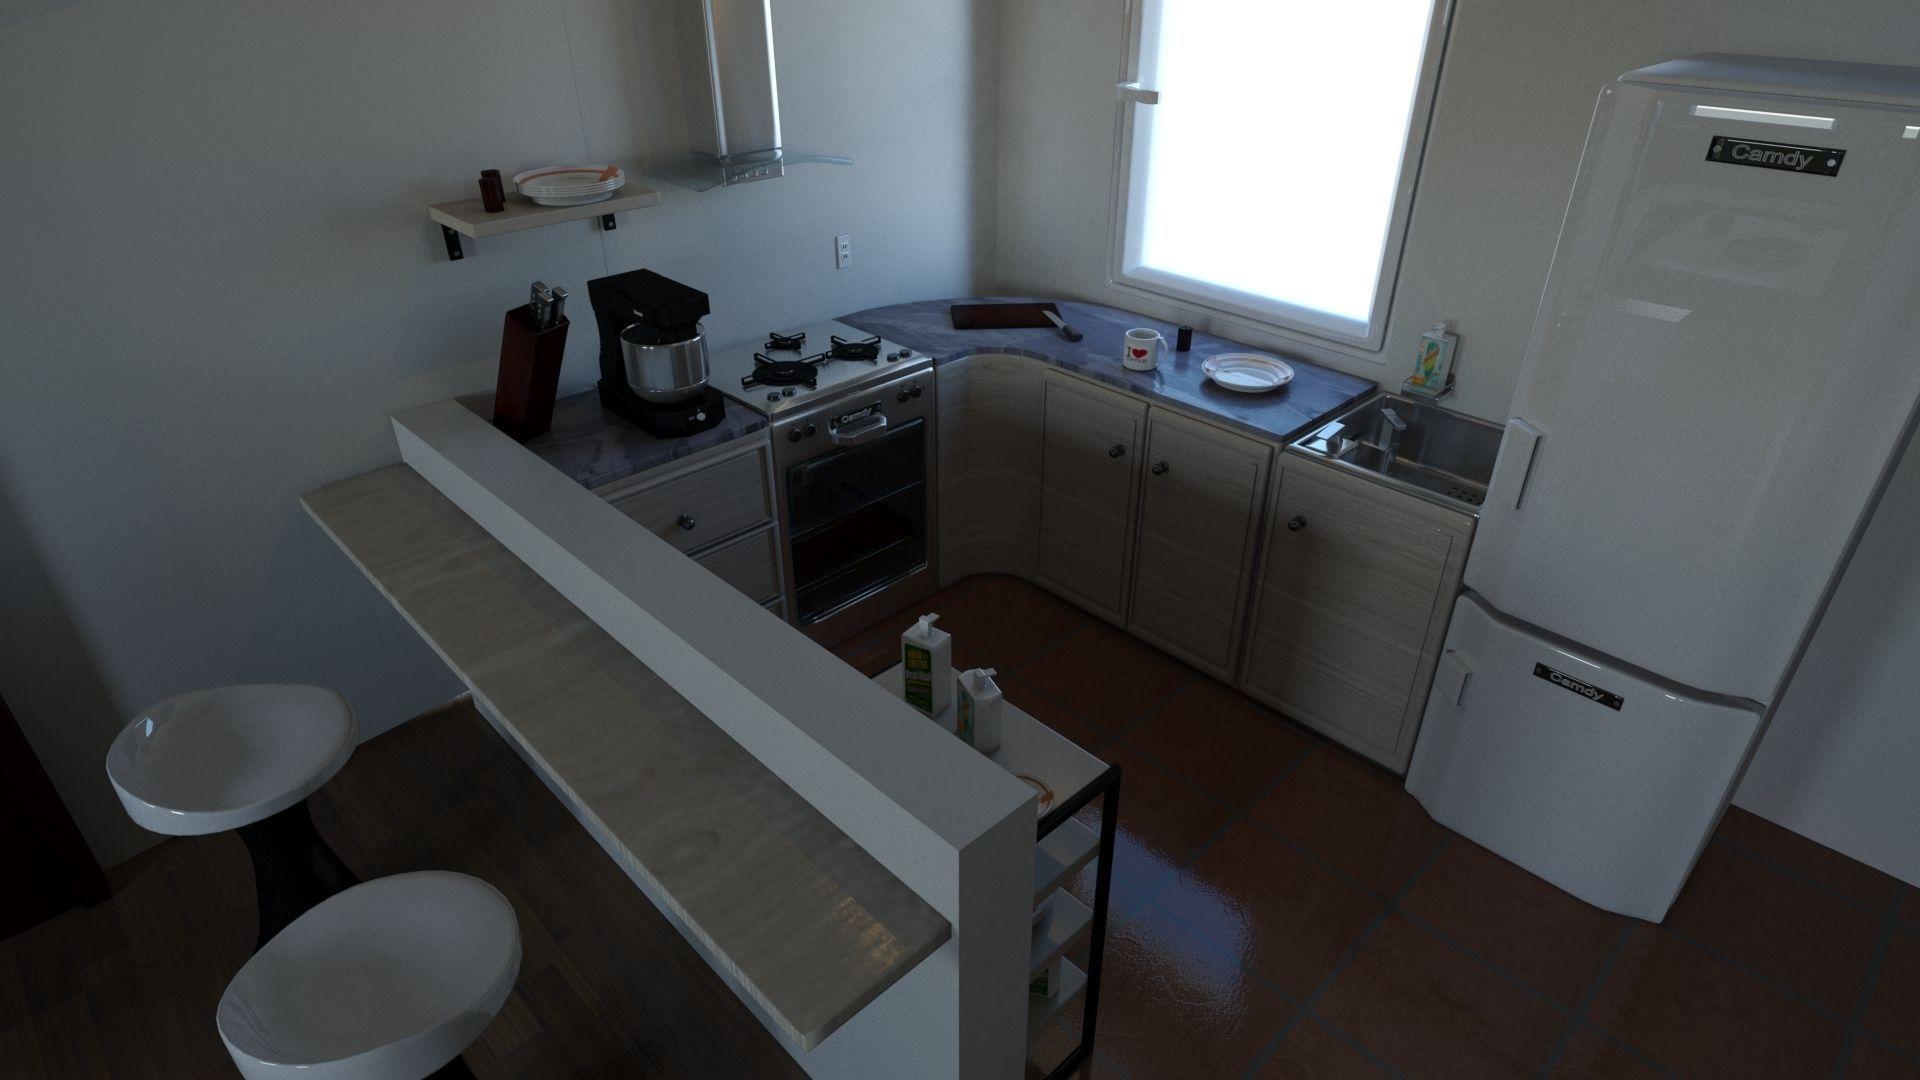 Living room with kitchen 3d model max obj for Kitchen room model